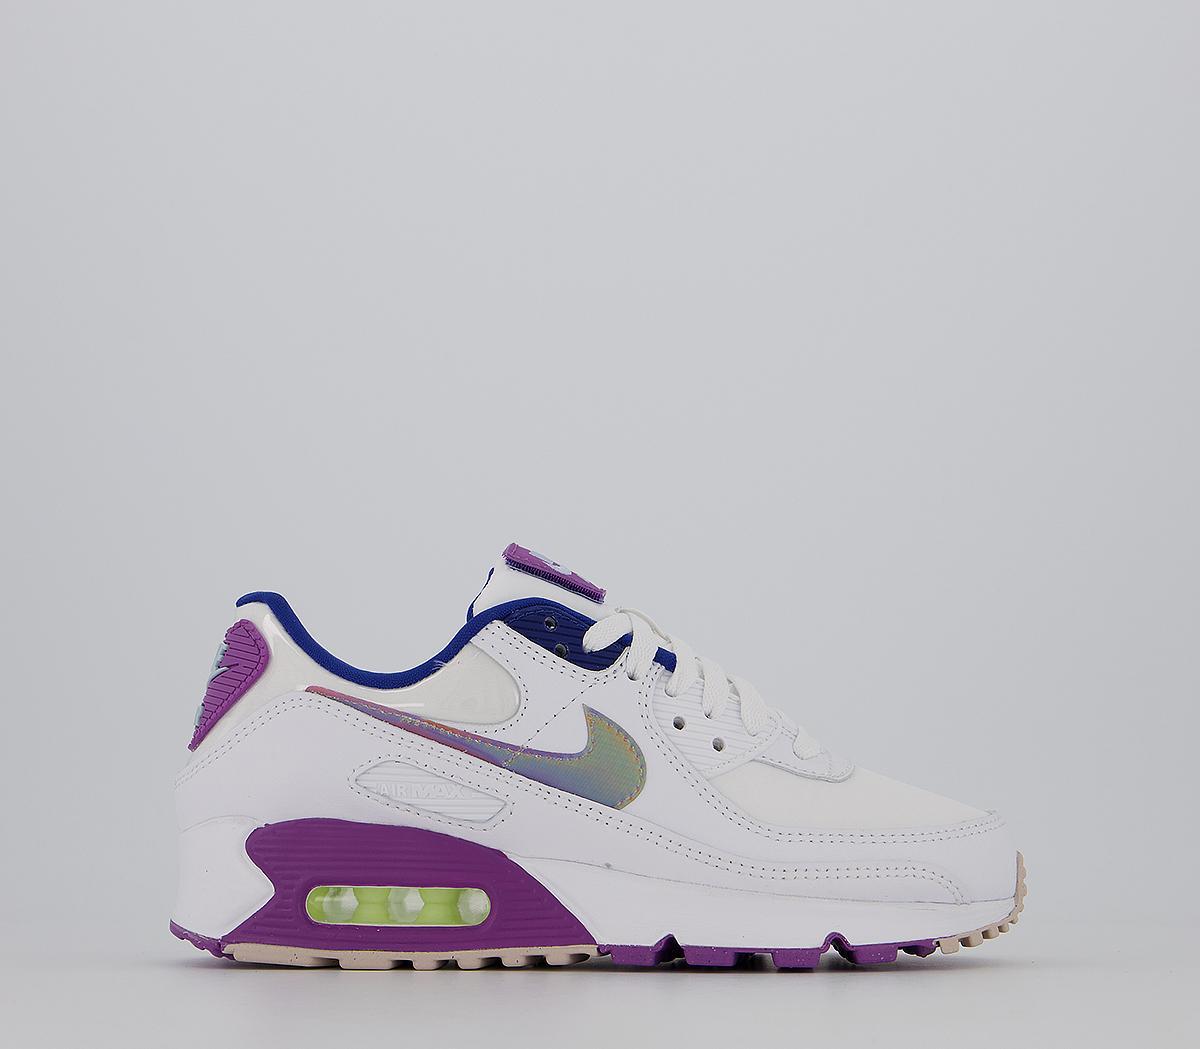 Nike Air Max 90 White Purple Barely